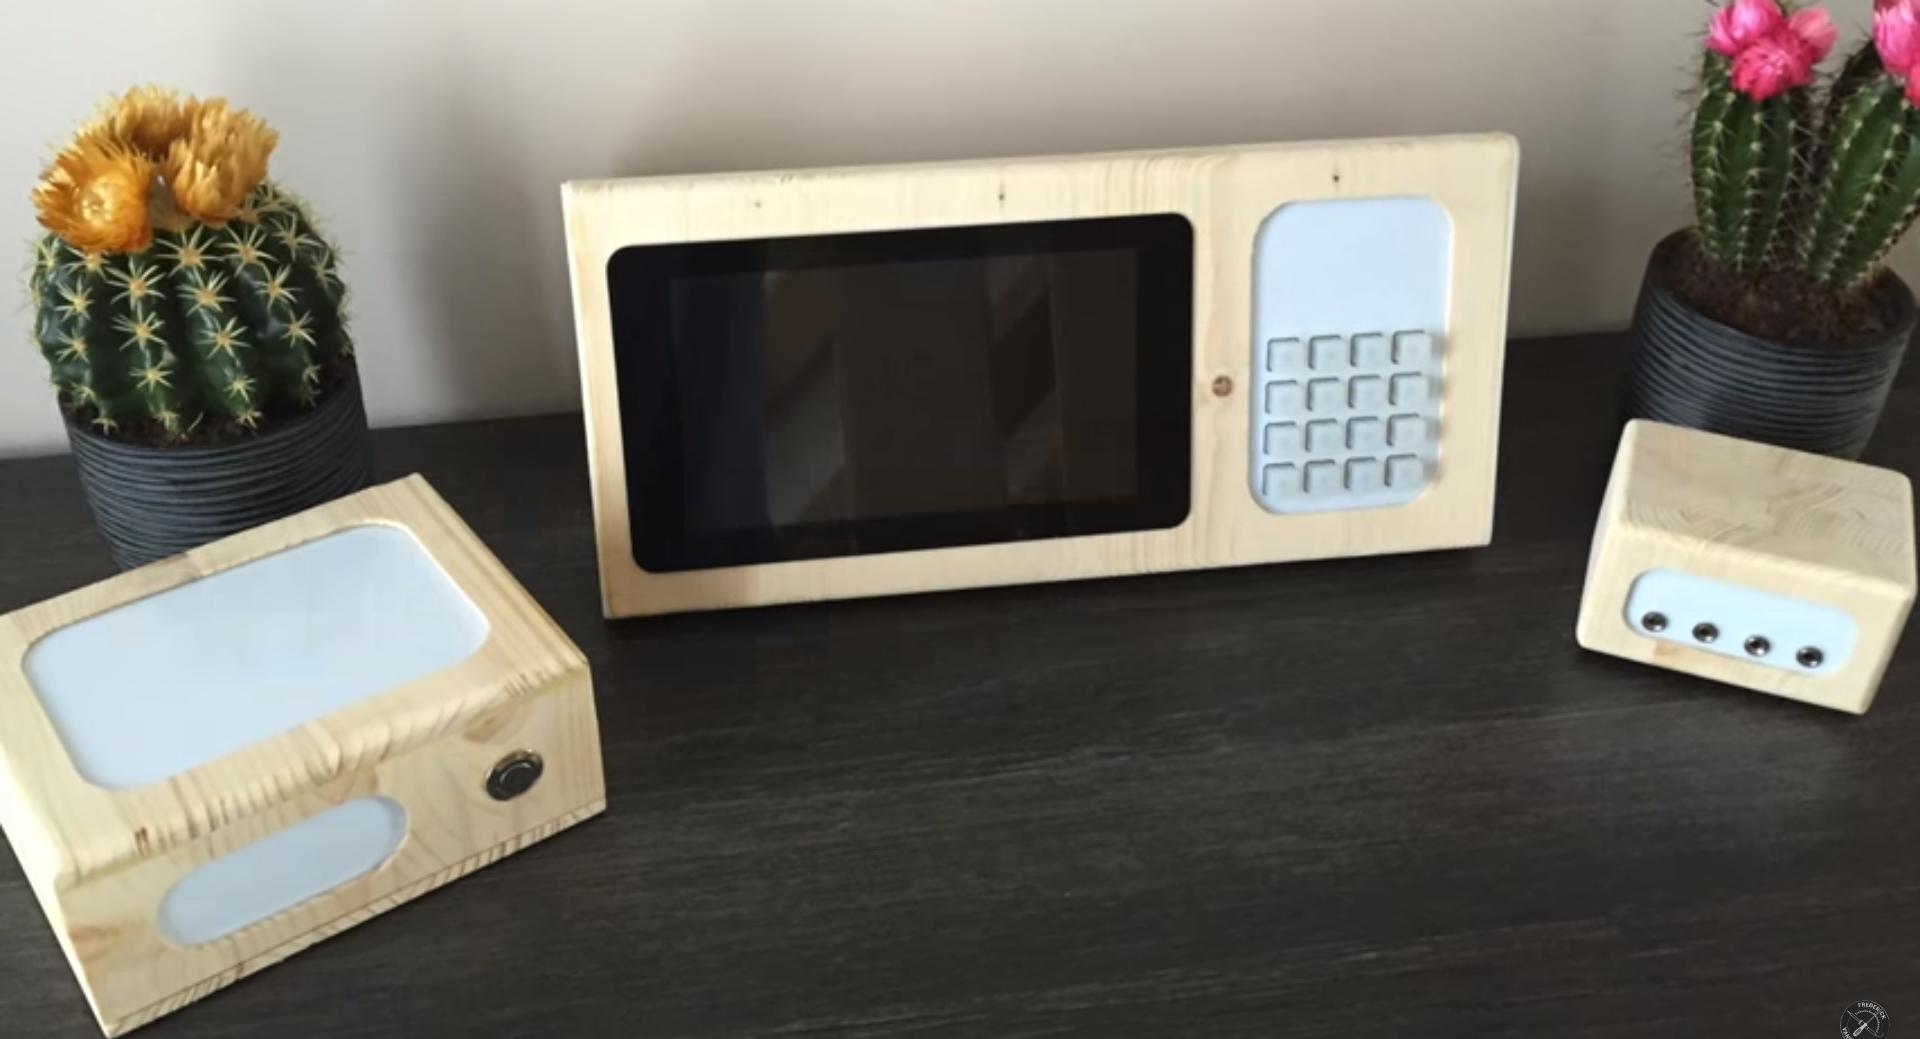 element14 Pi IoT Smarter Spaces Design Challenge